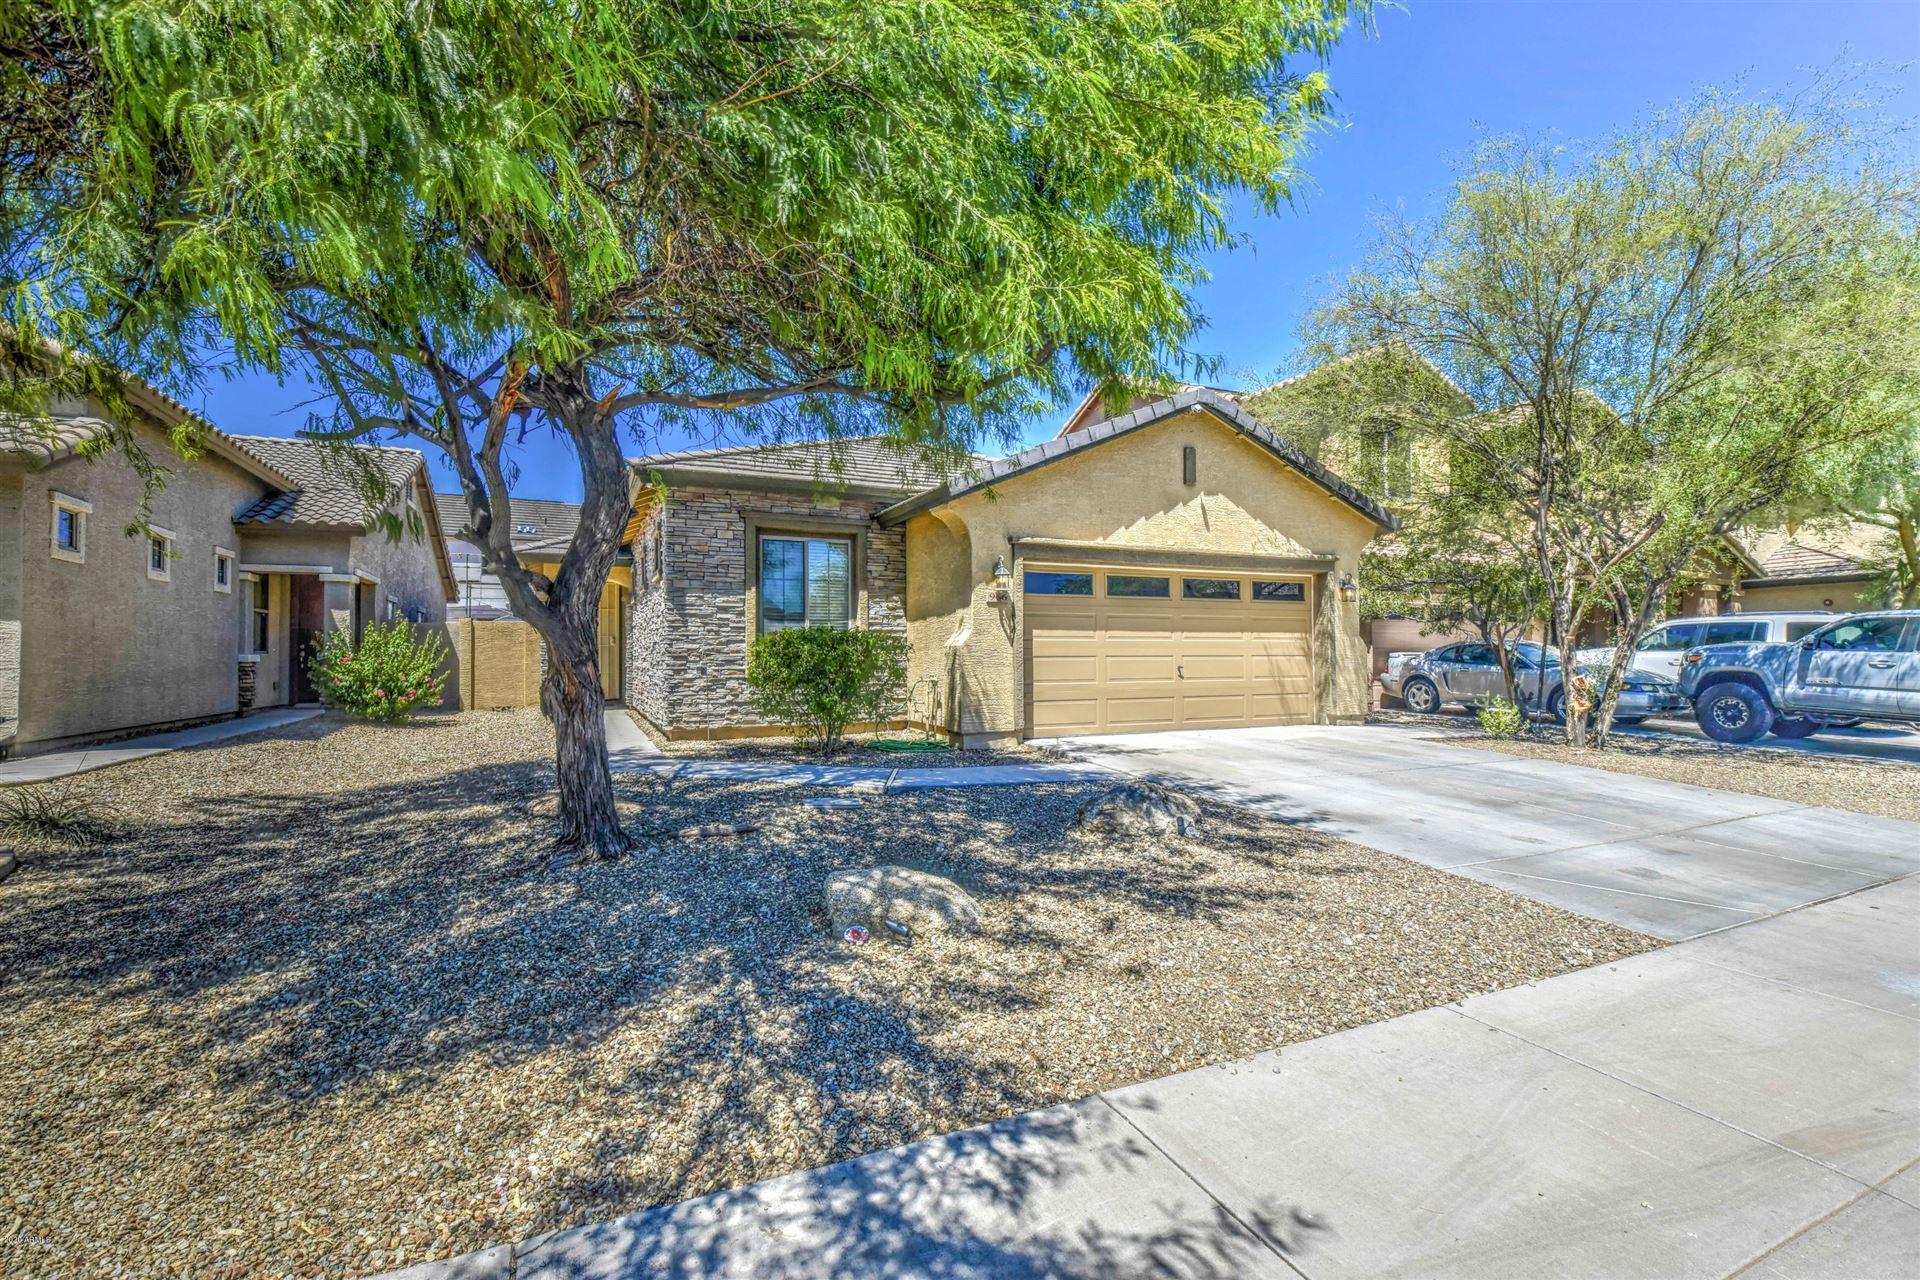 966 E CORRALL Street, Avondale, AZ 85323 - #: 6100726